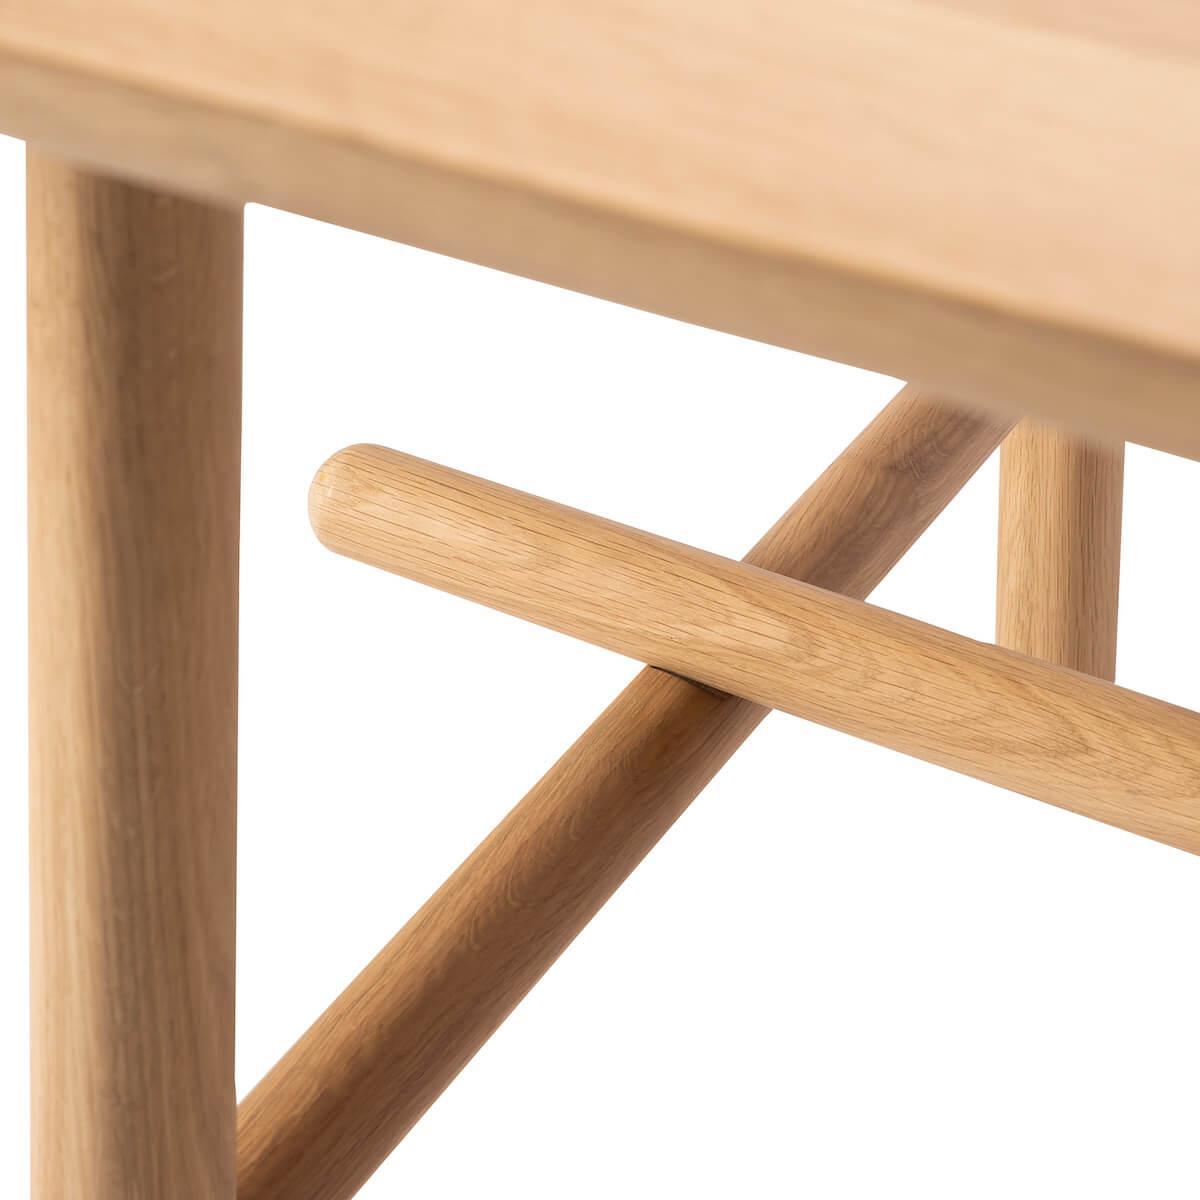 Table 100x180cm PROFILE Ethnicraft chêne